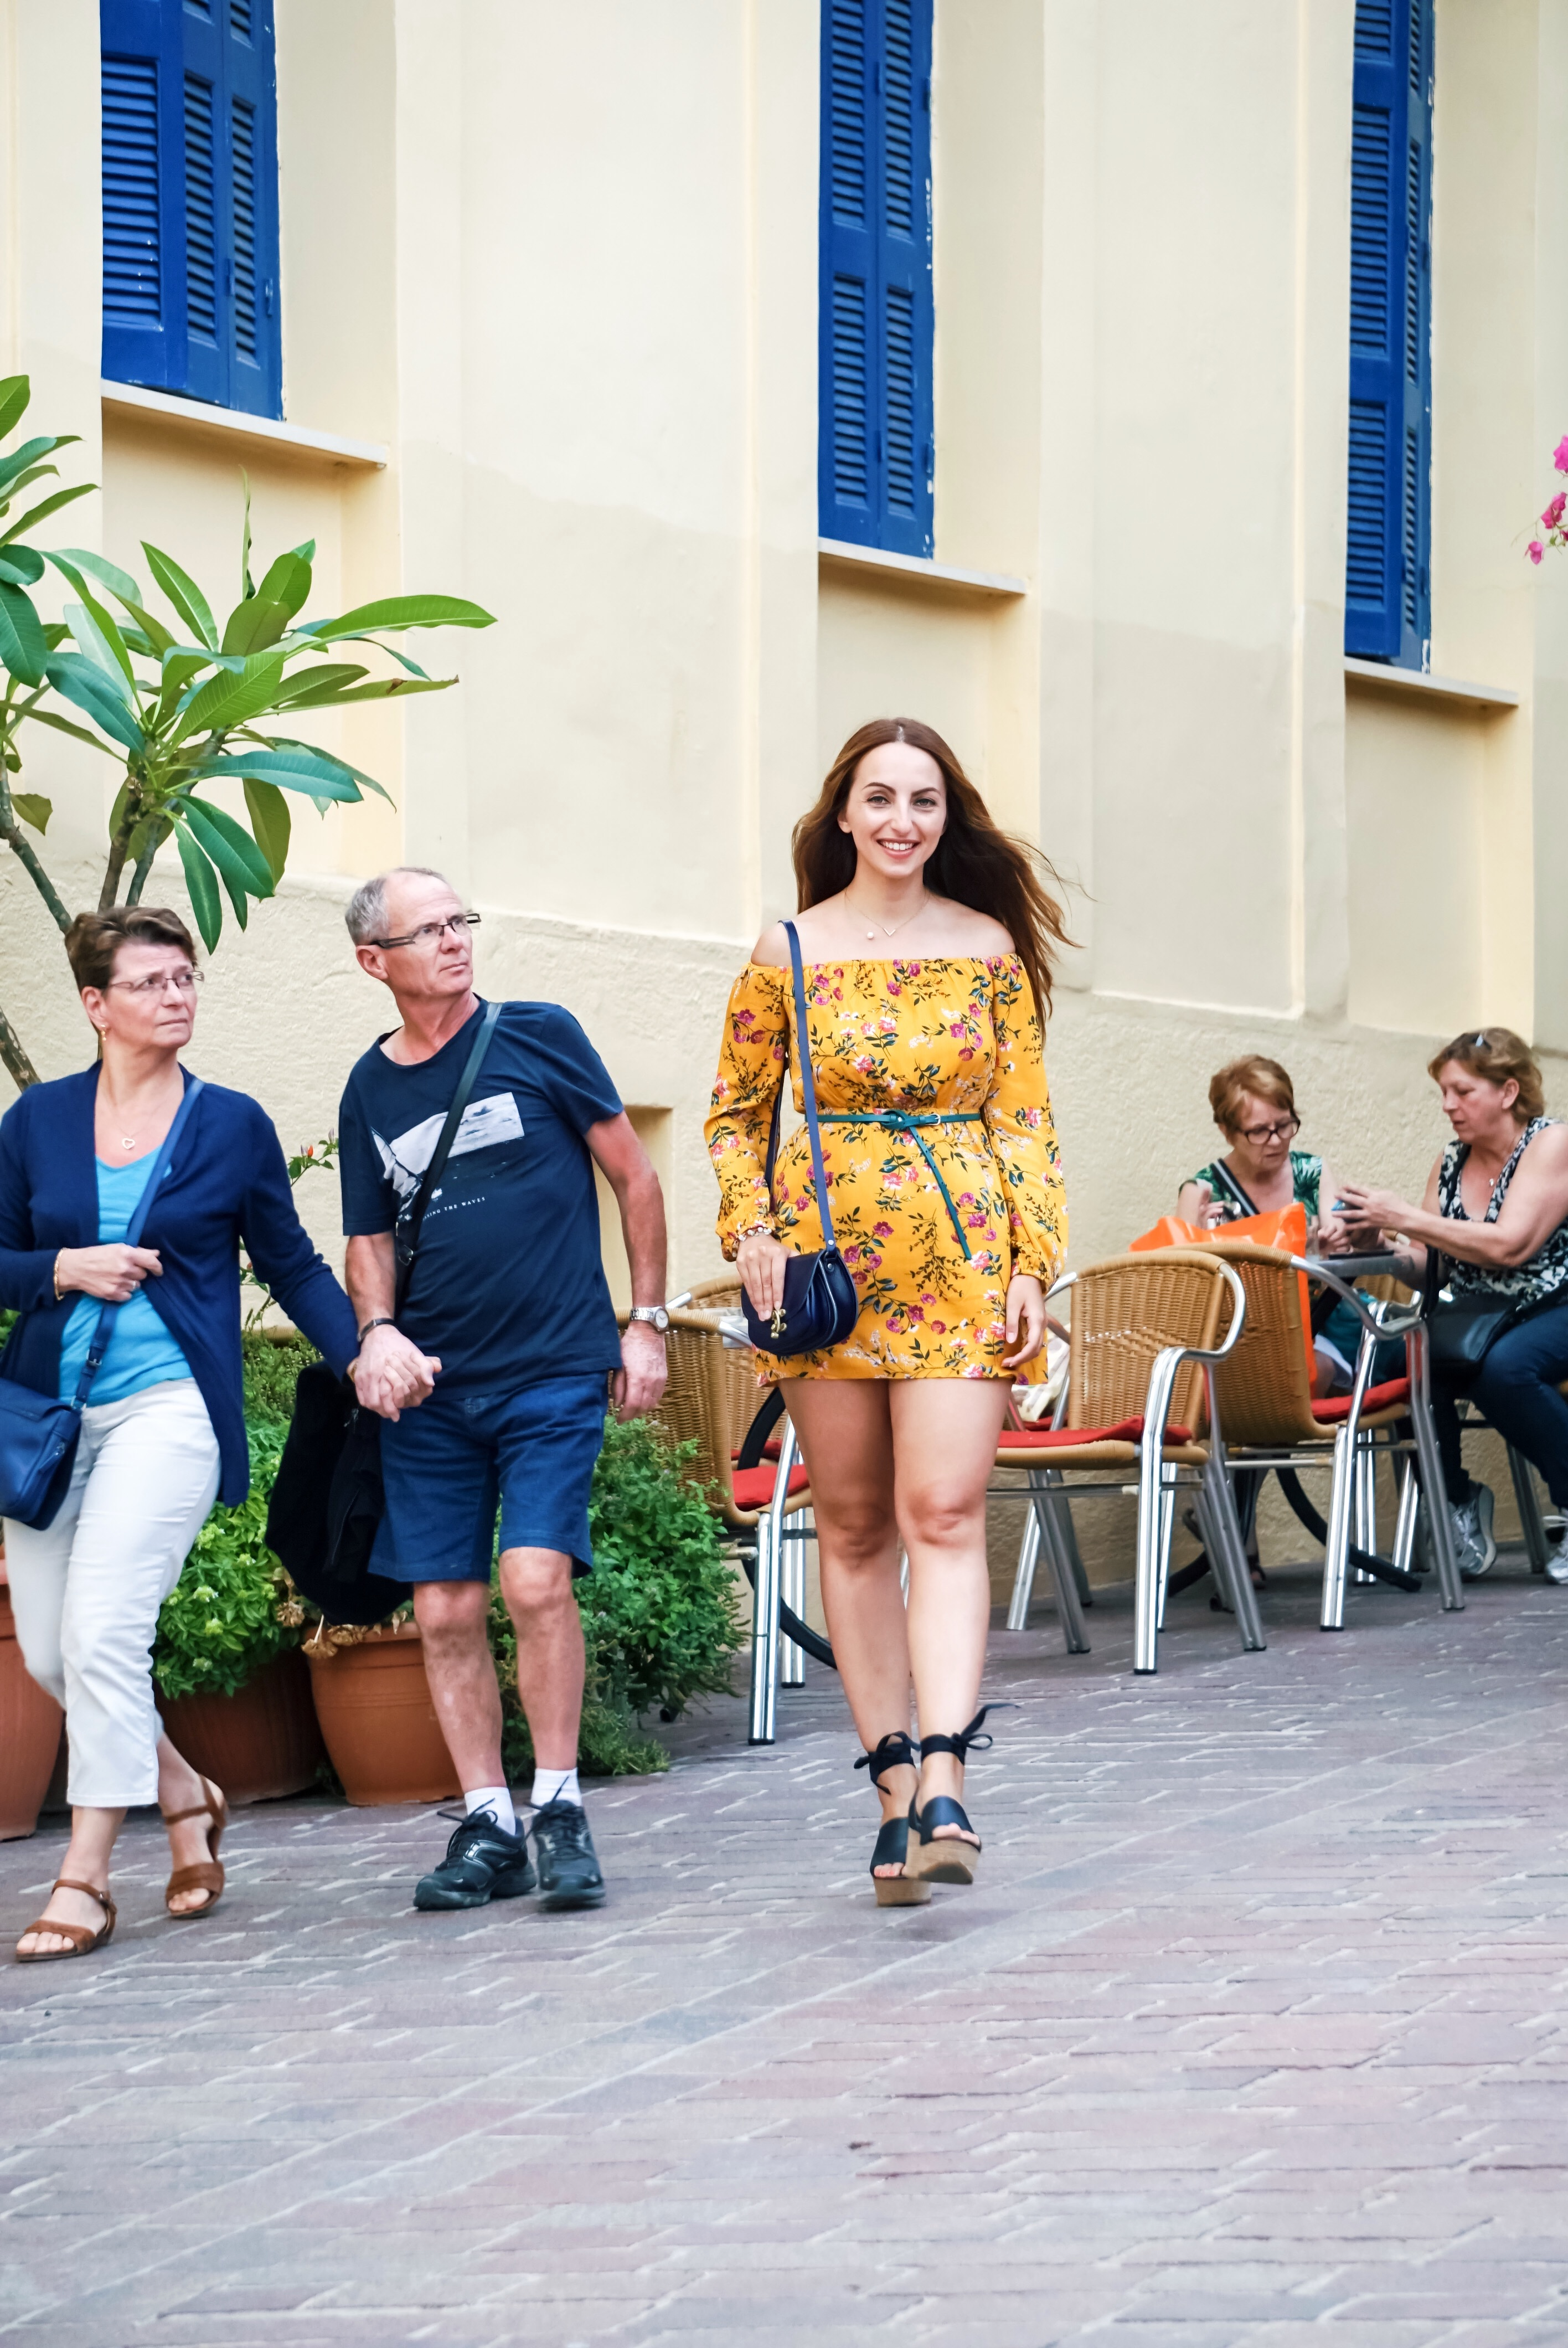 Chania-Crete-Fashionblogger-Outfit-Post